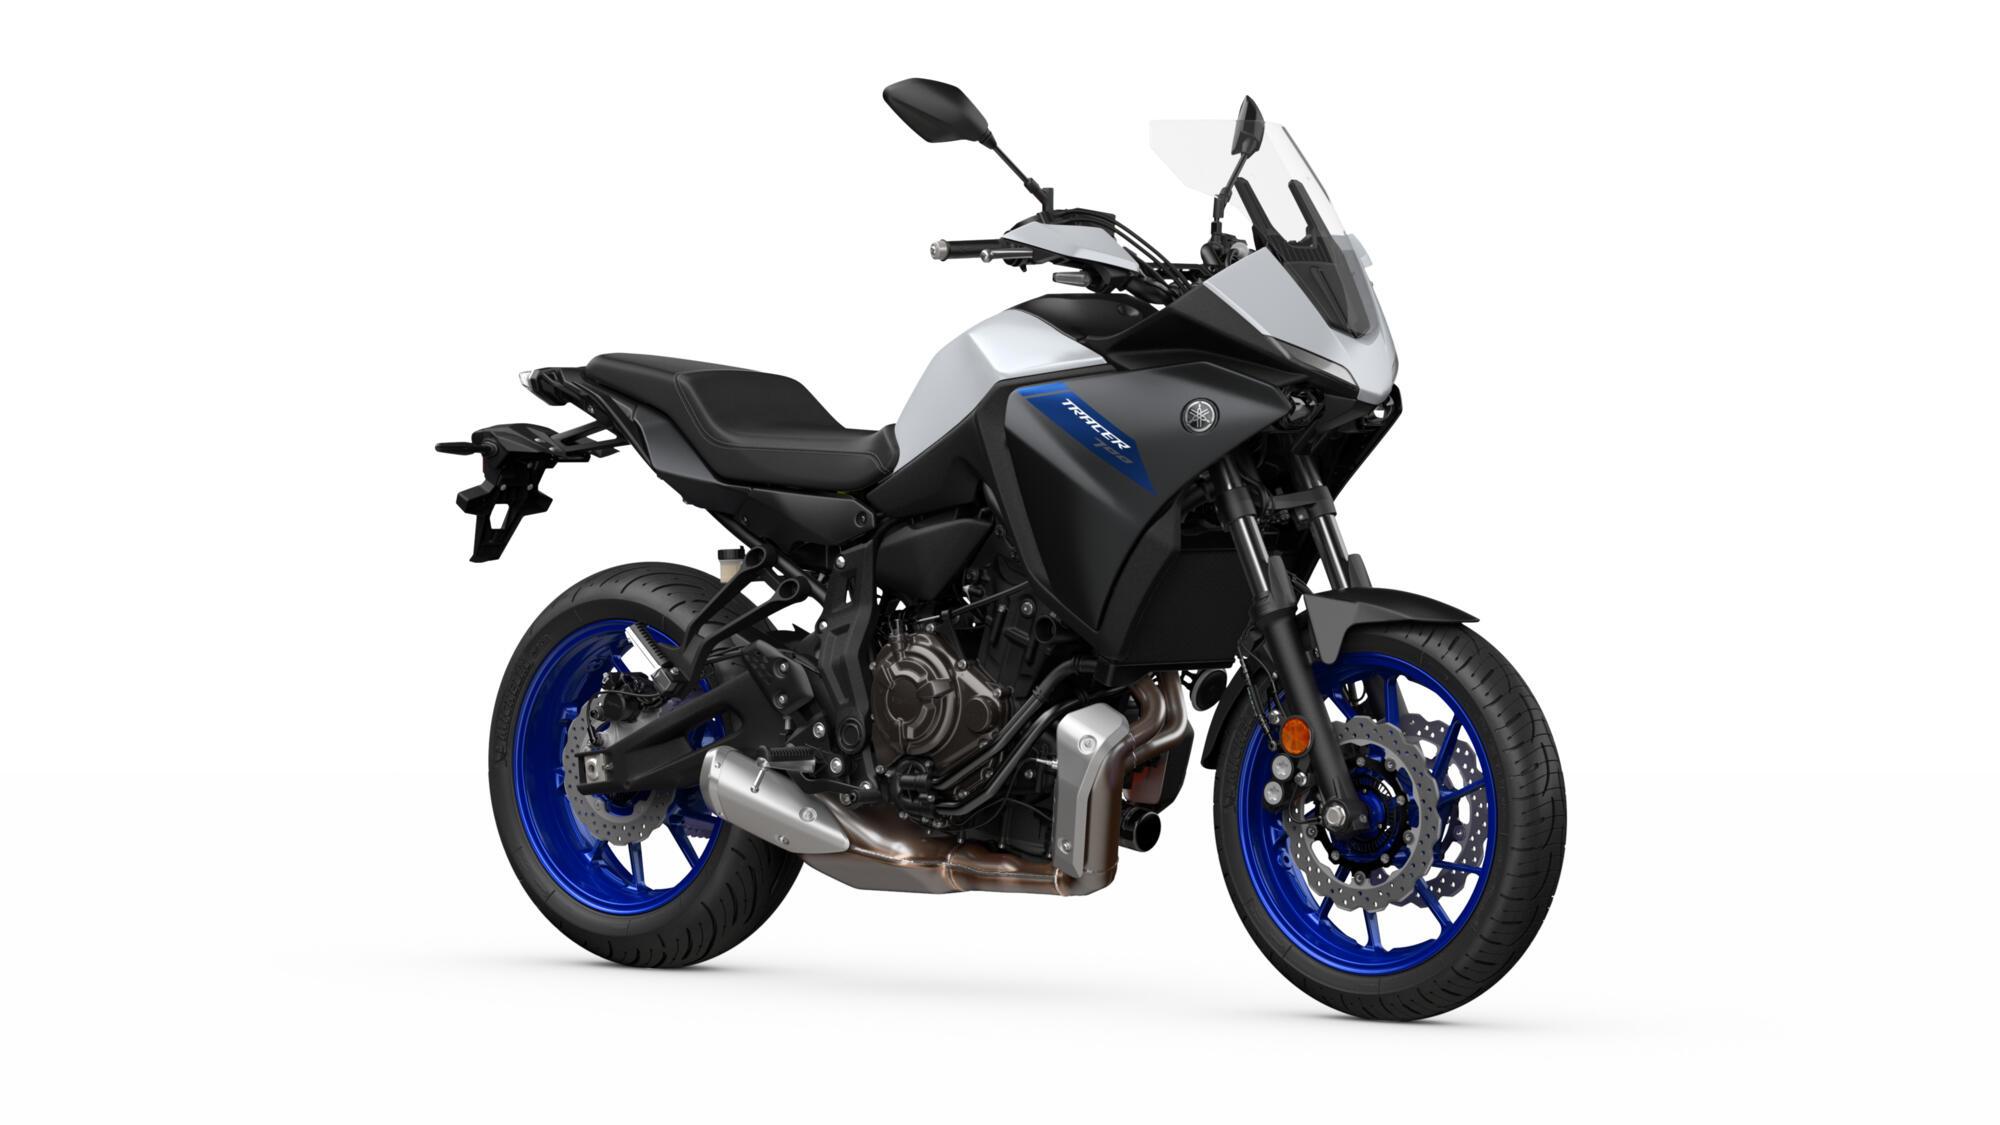 2020-Yamaha-MT07TR-EU-Icon_Grey-Studio-001-03.jpg